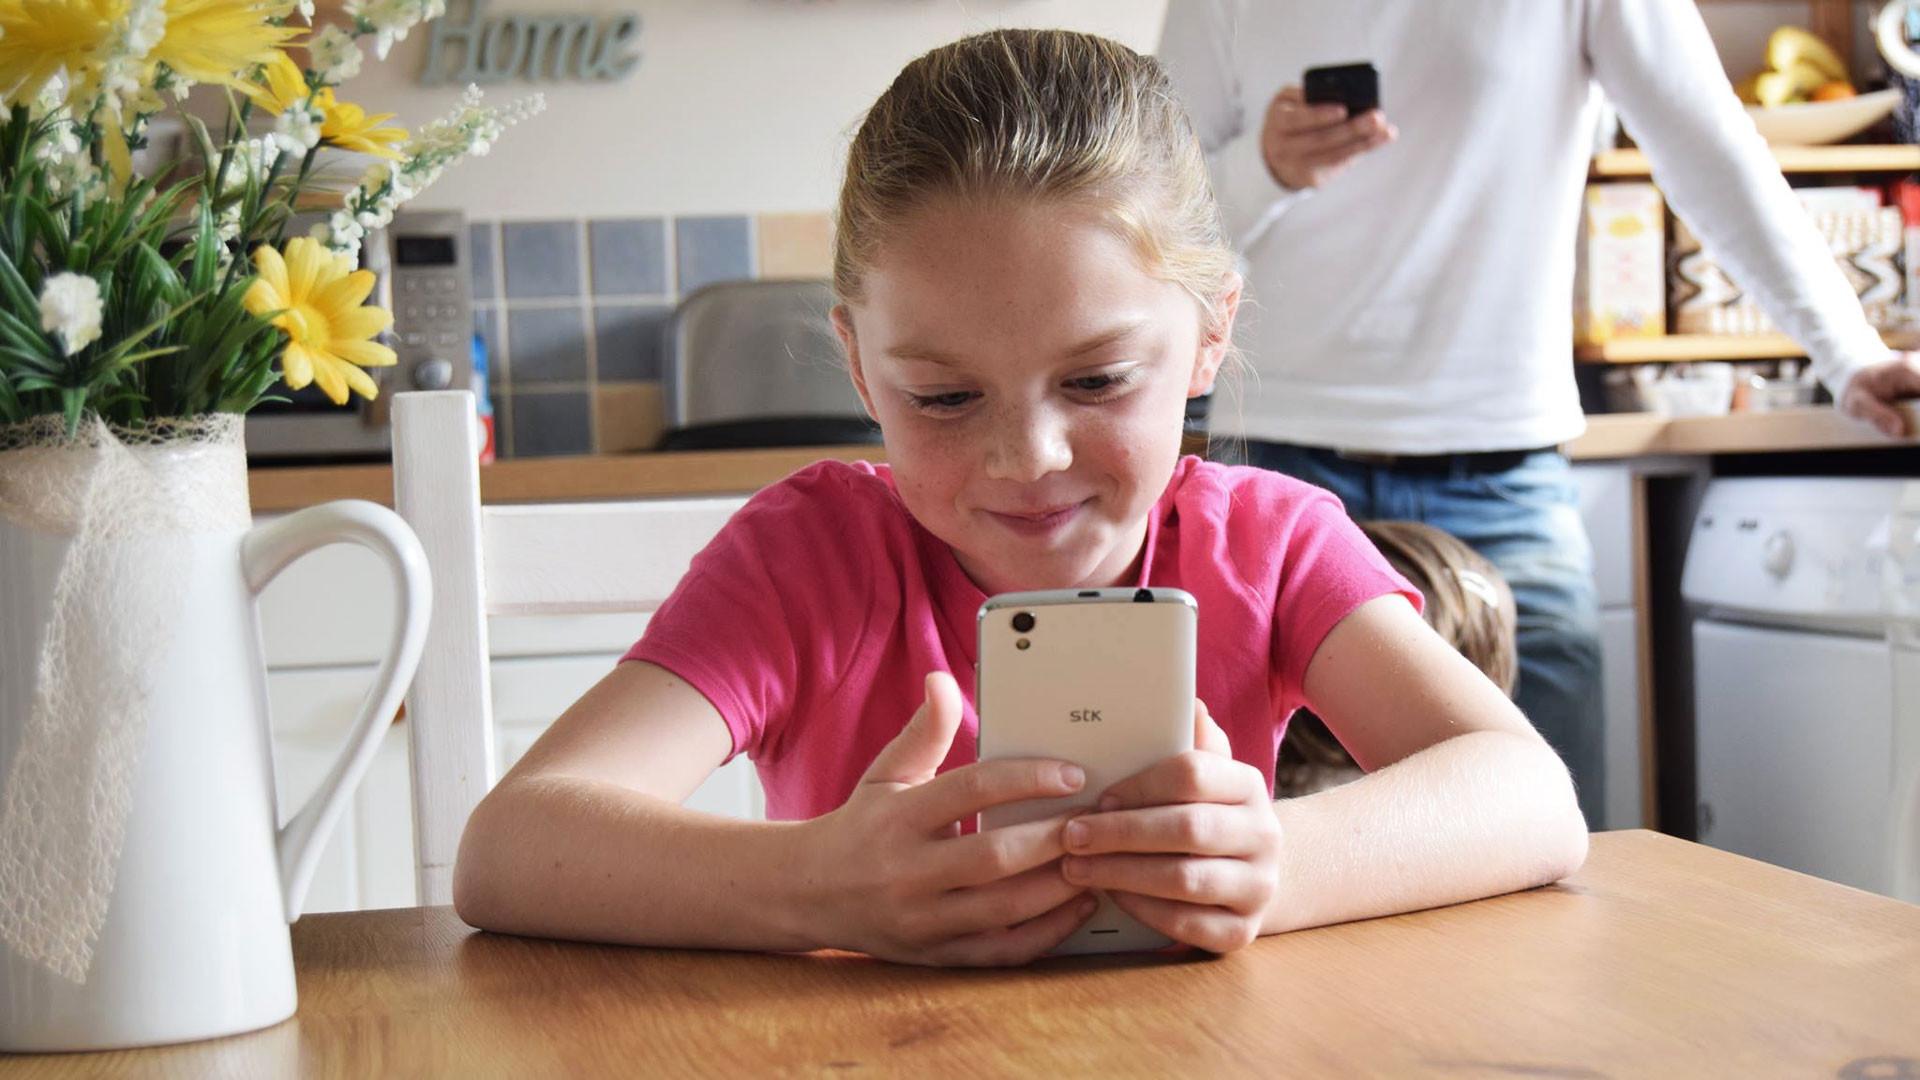 "<p>Фото: &copy;&nbsp;<a href=""https://www.facebook.com/monqi.co/photos/a.1739910186292945.1073741828.1739381563012474/2083311775286116/?type=3&amp;theater"" target=""_blank"">facebook.com/monqi</a></p>"